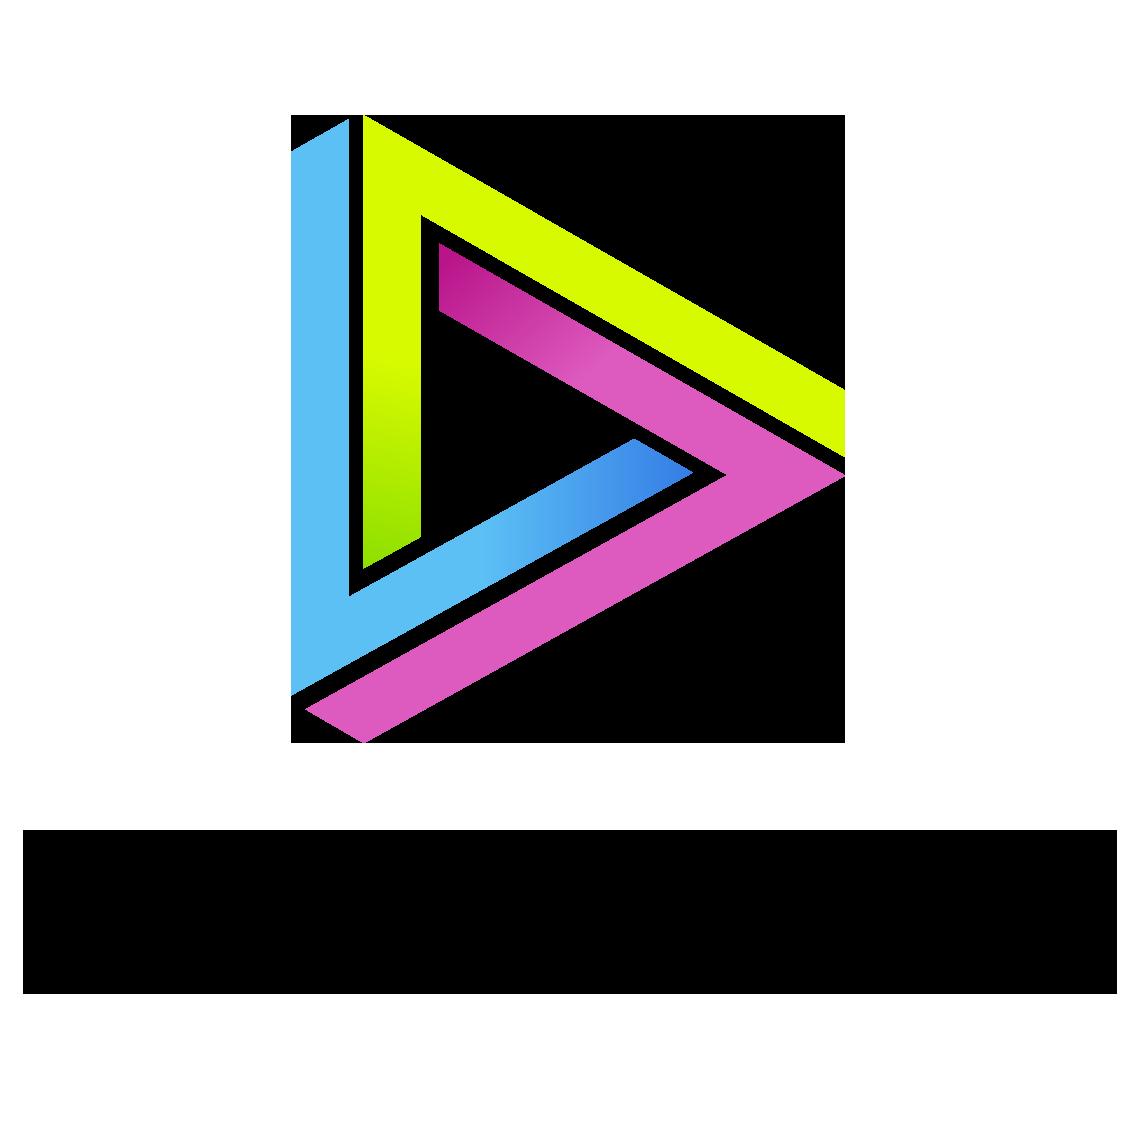 3RDSENSE-square-logo-dark-colour.png